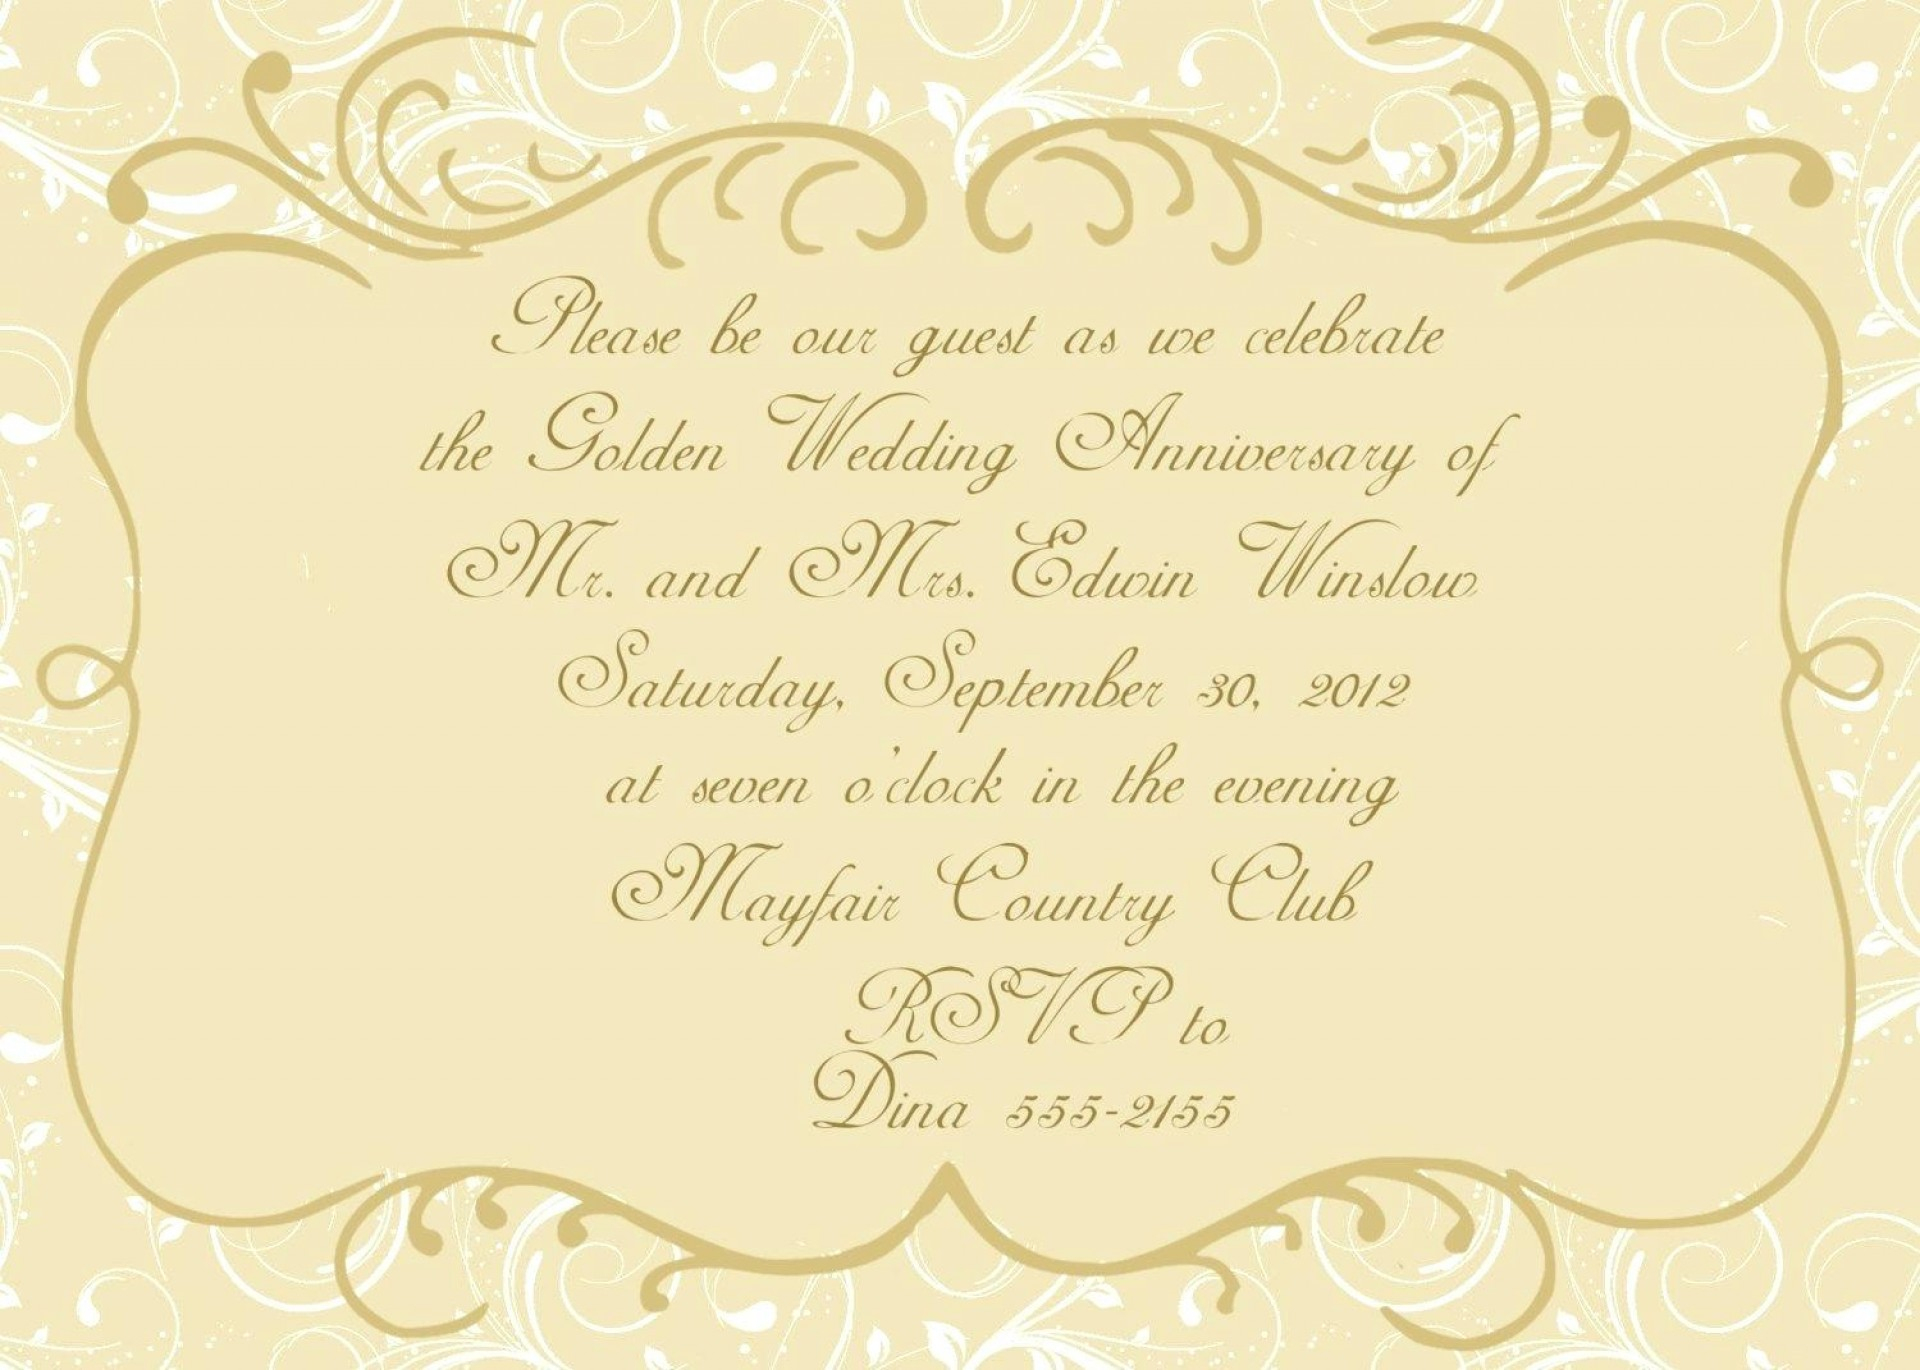 001 Template Ideas 60Th Birthday ~ Ulyssesroom - Free Printable 60Th Wedding Anniversary Invitations